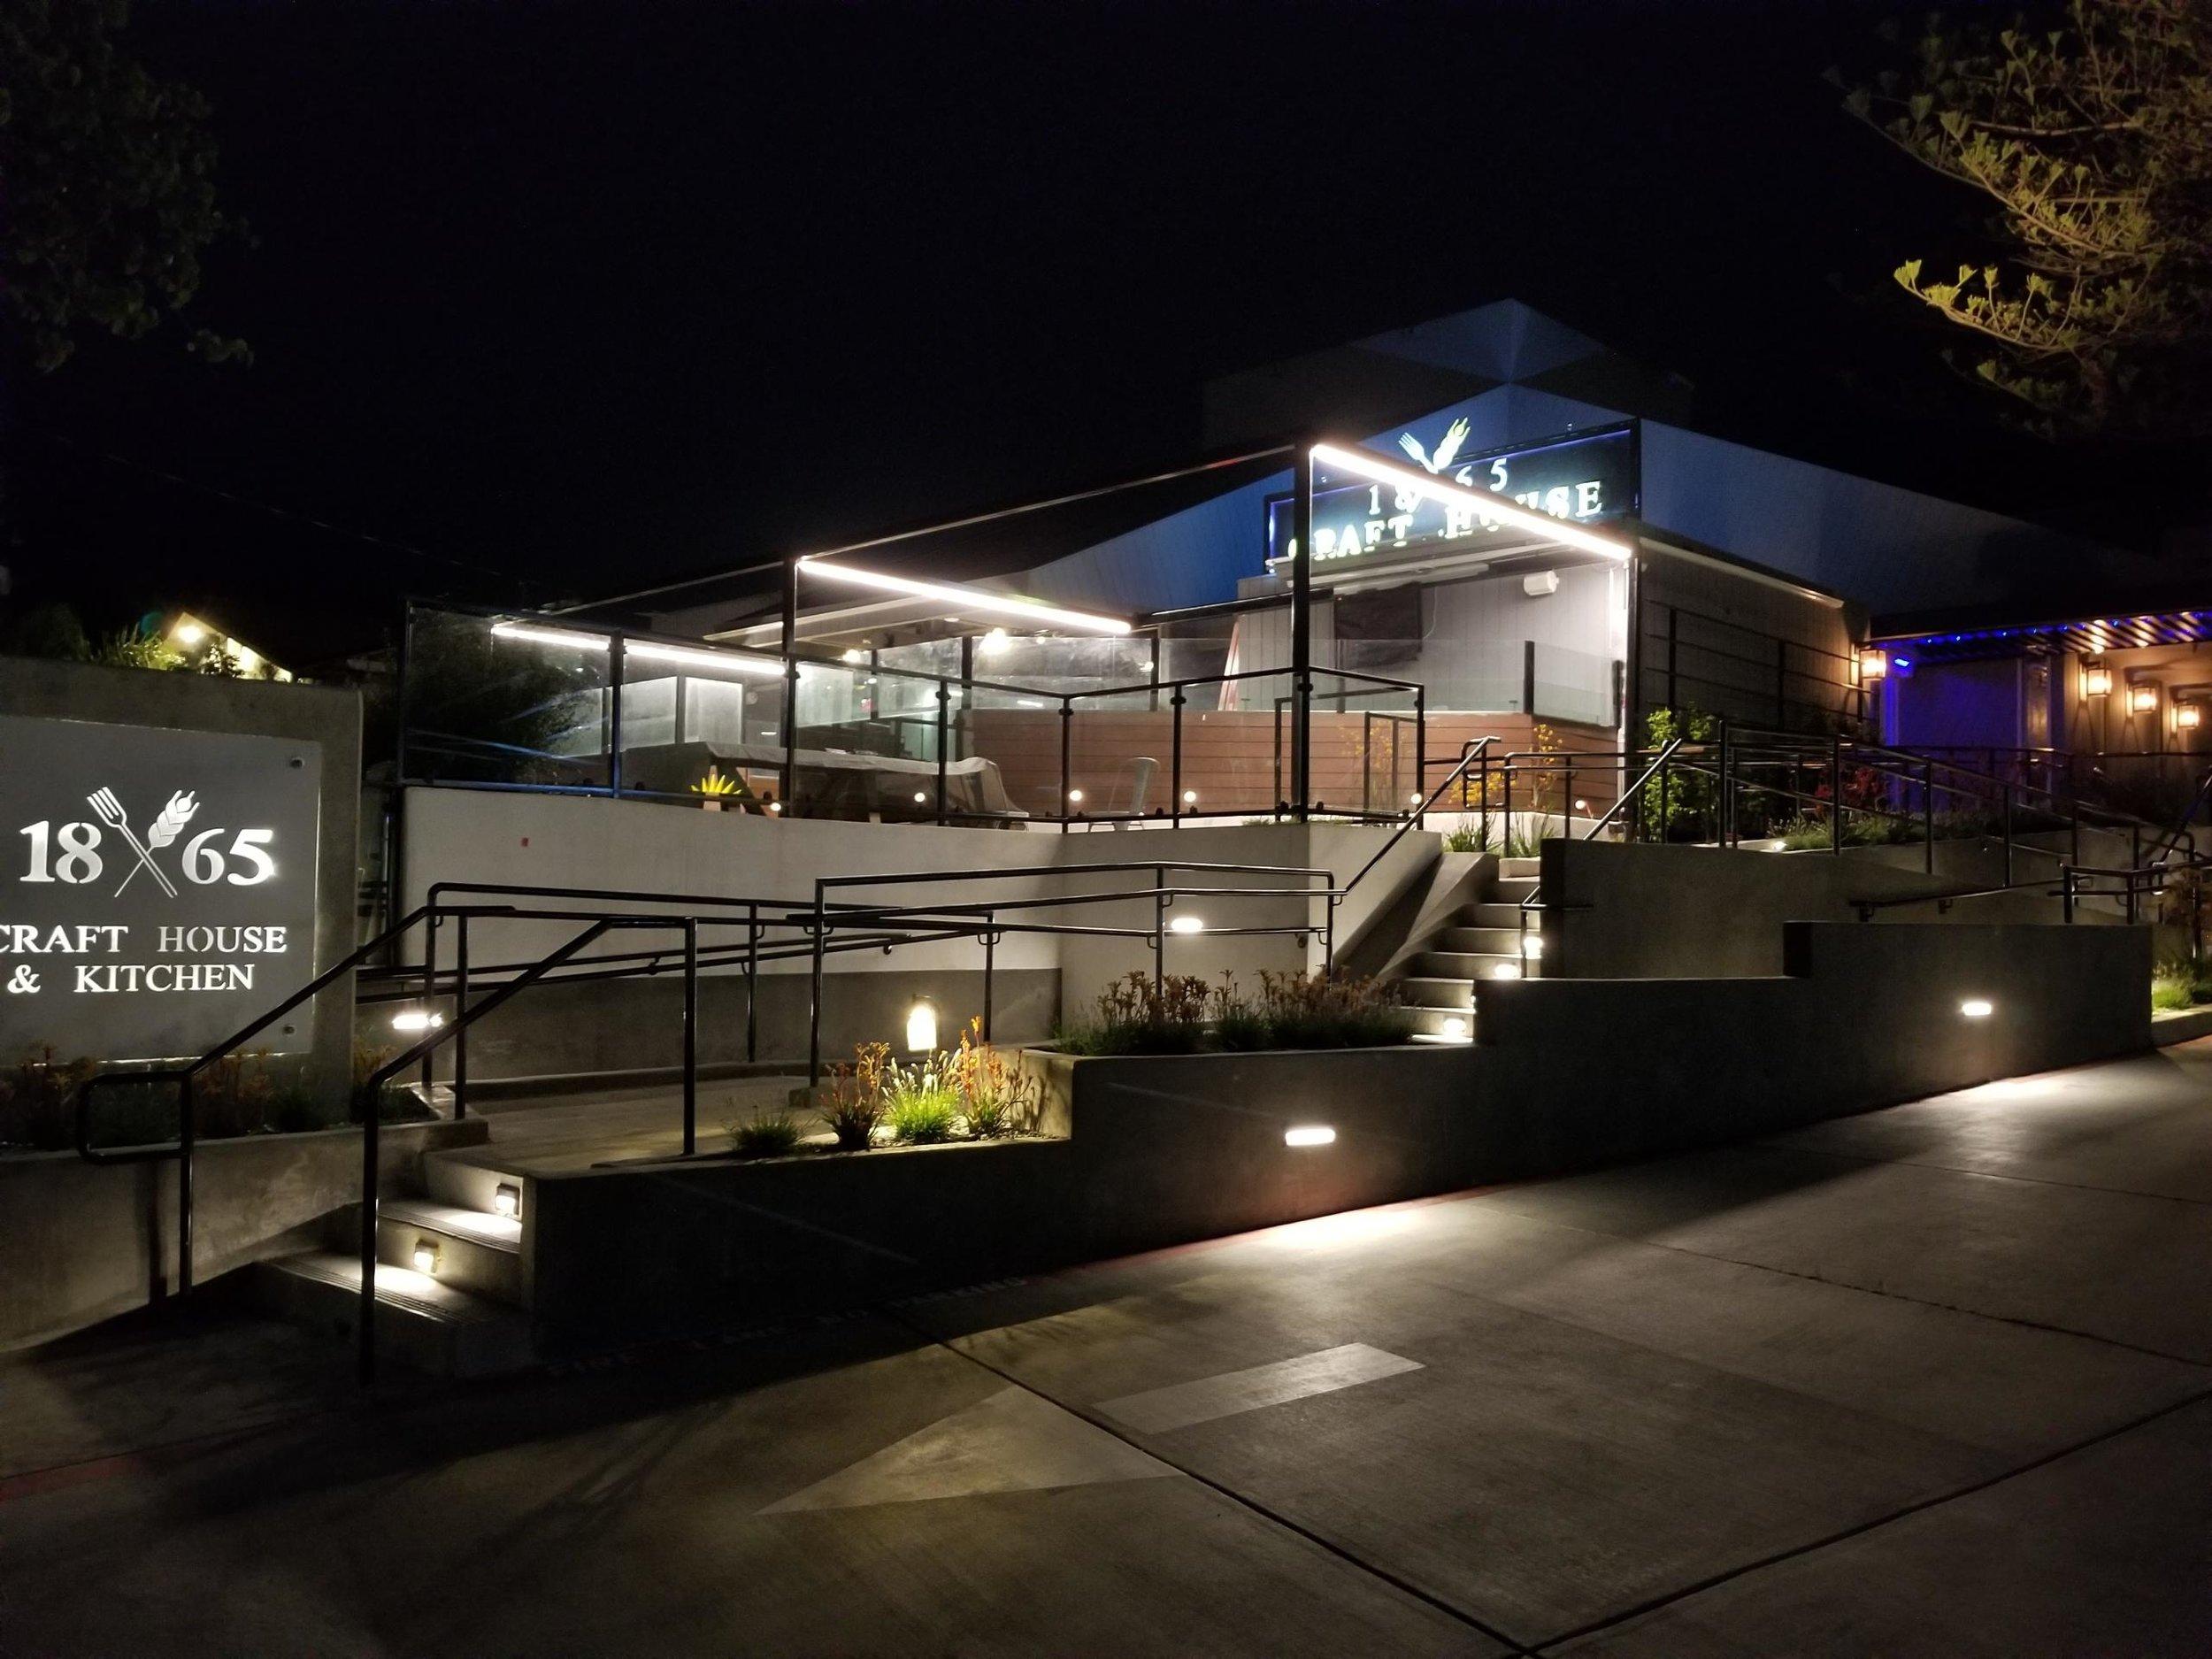 1865 Monterey Street San Luis Obispo, CA, 93401 (805) 439 3739